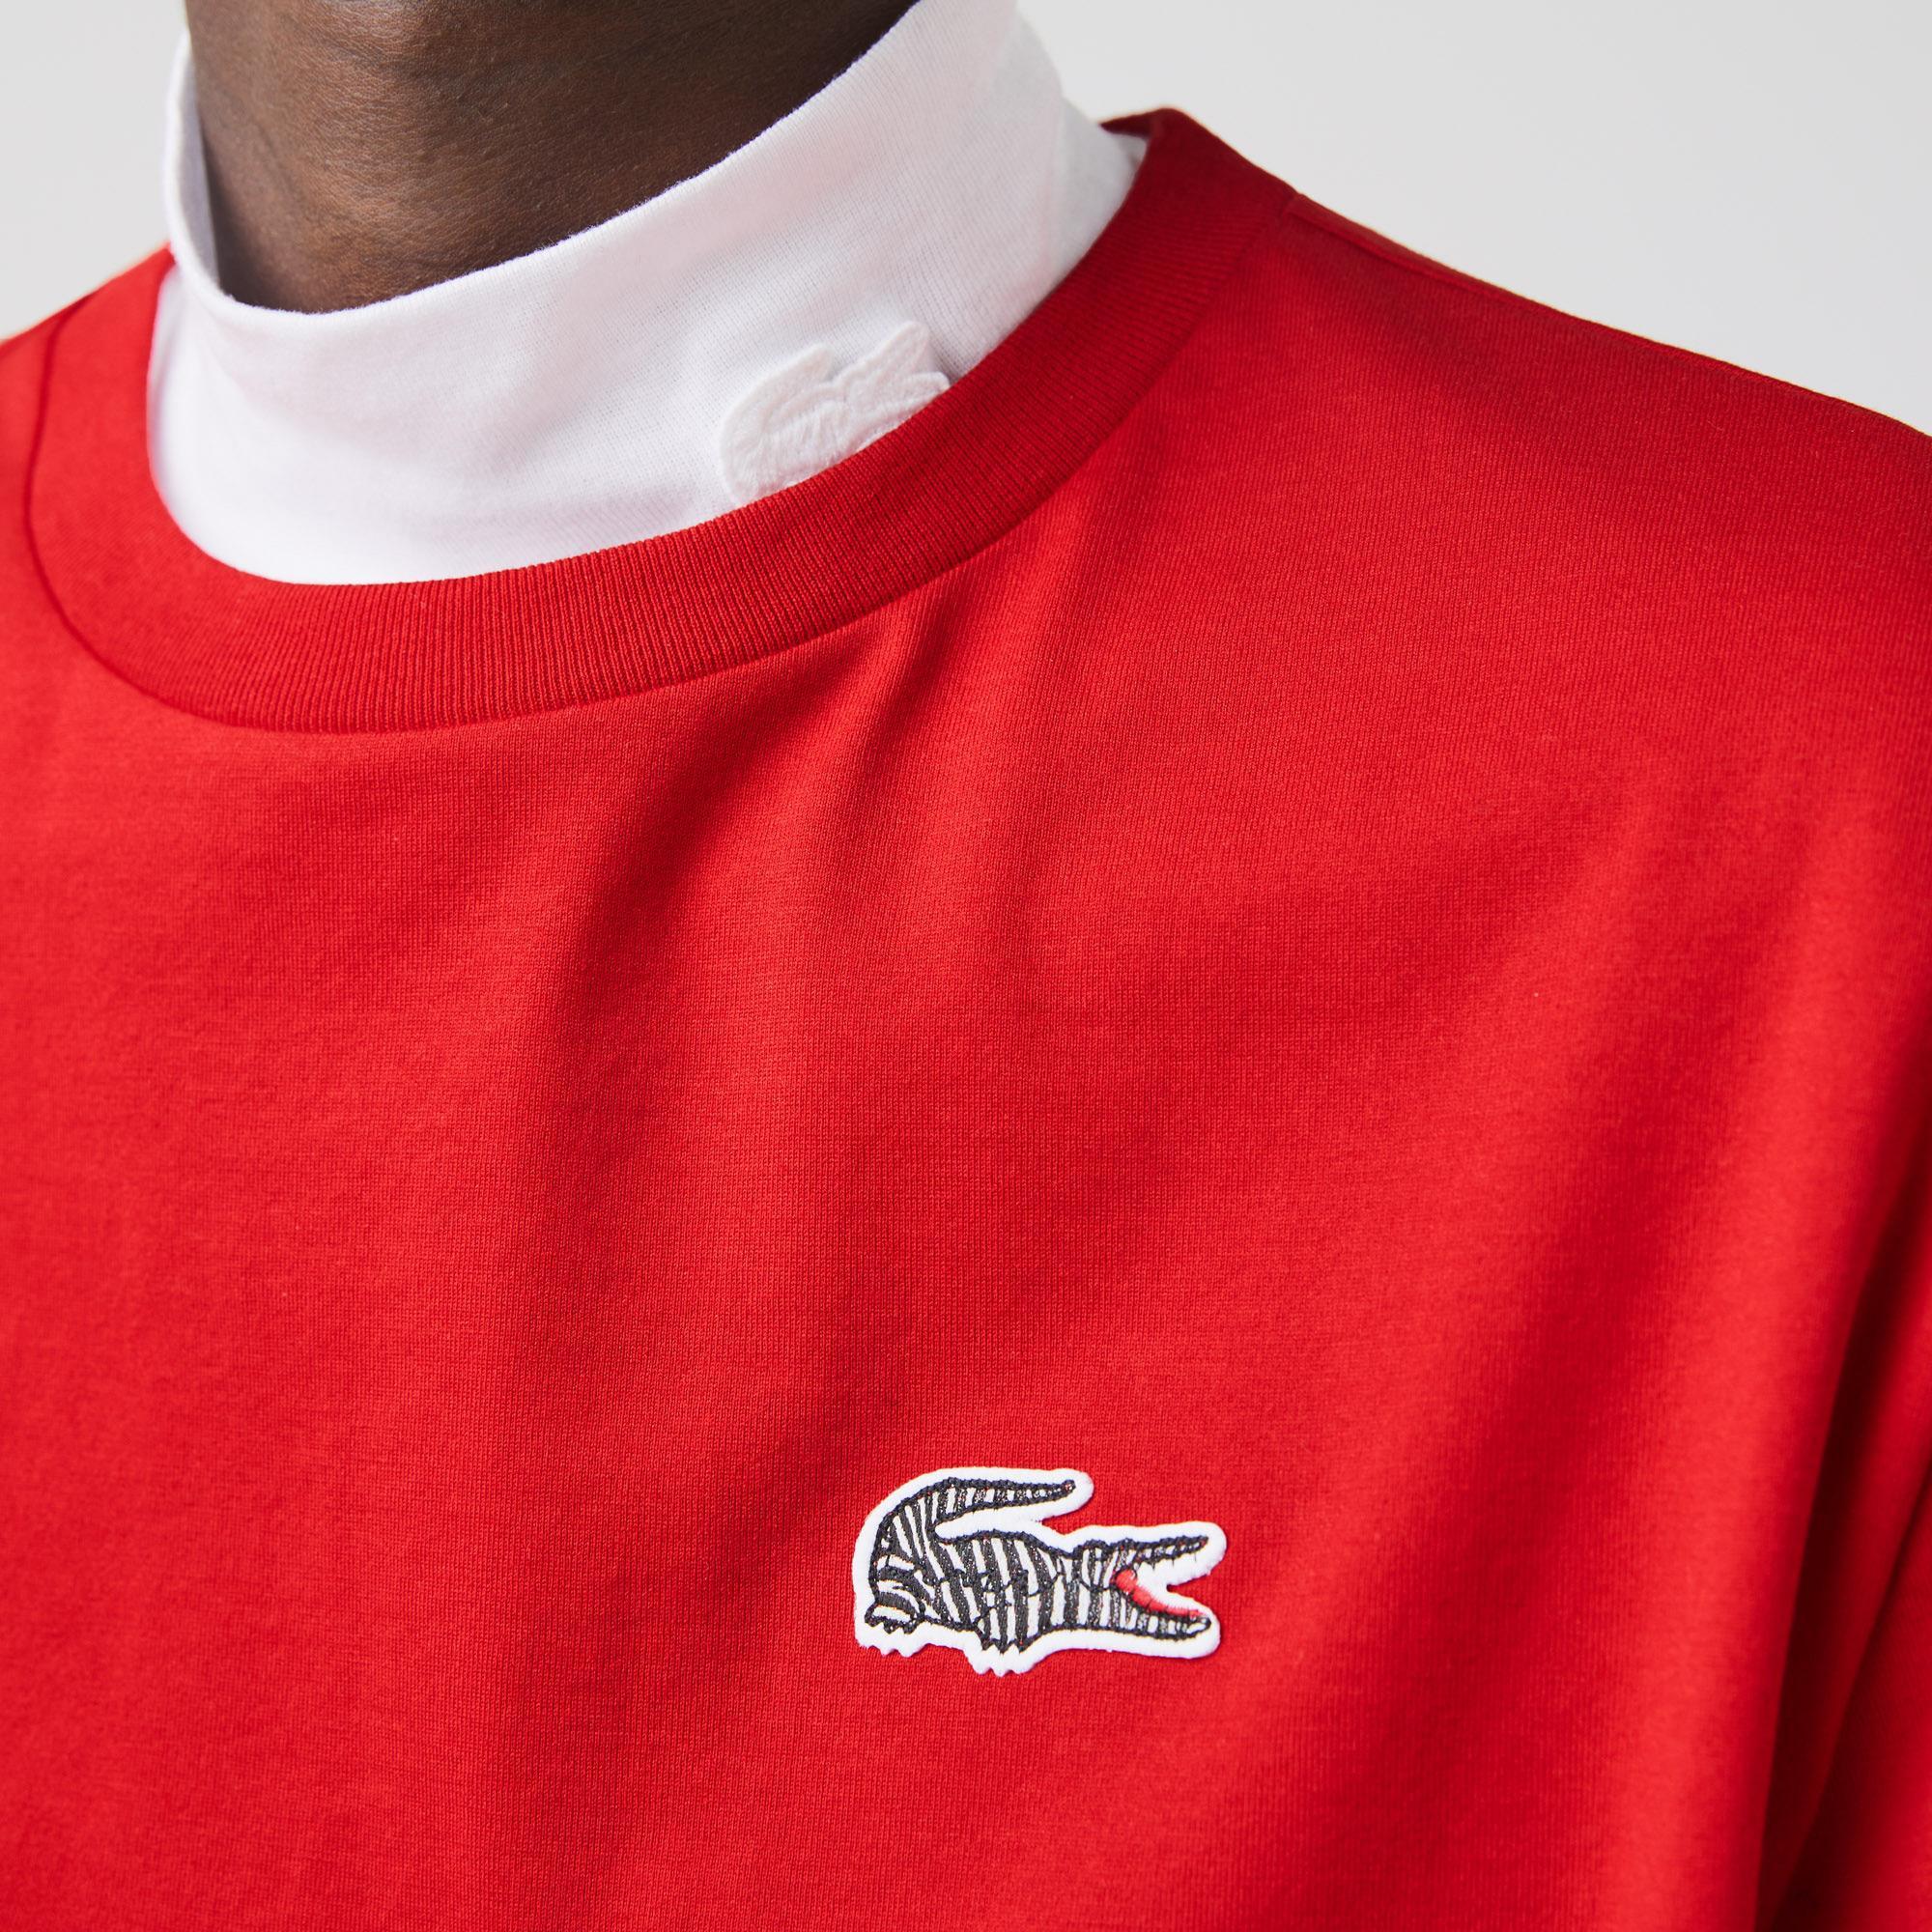 Lacoste x National Geographic Kadın Bisiklet Yaka Kırmızı T-Shirt